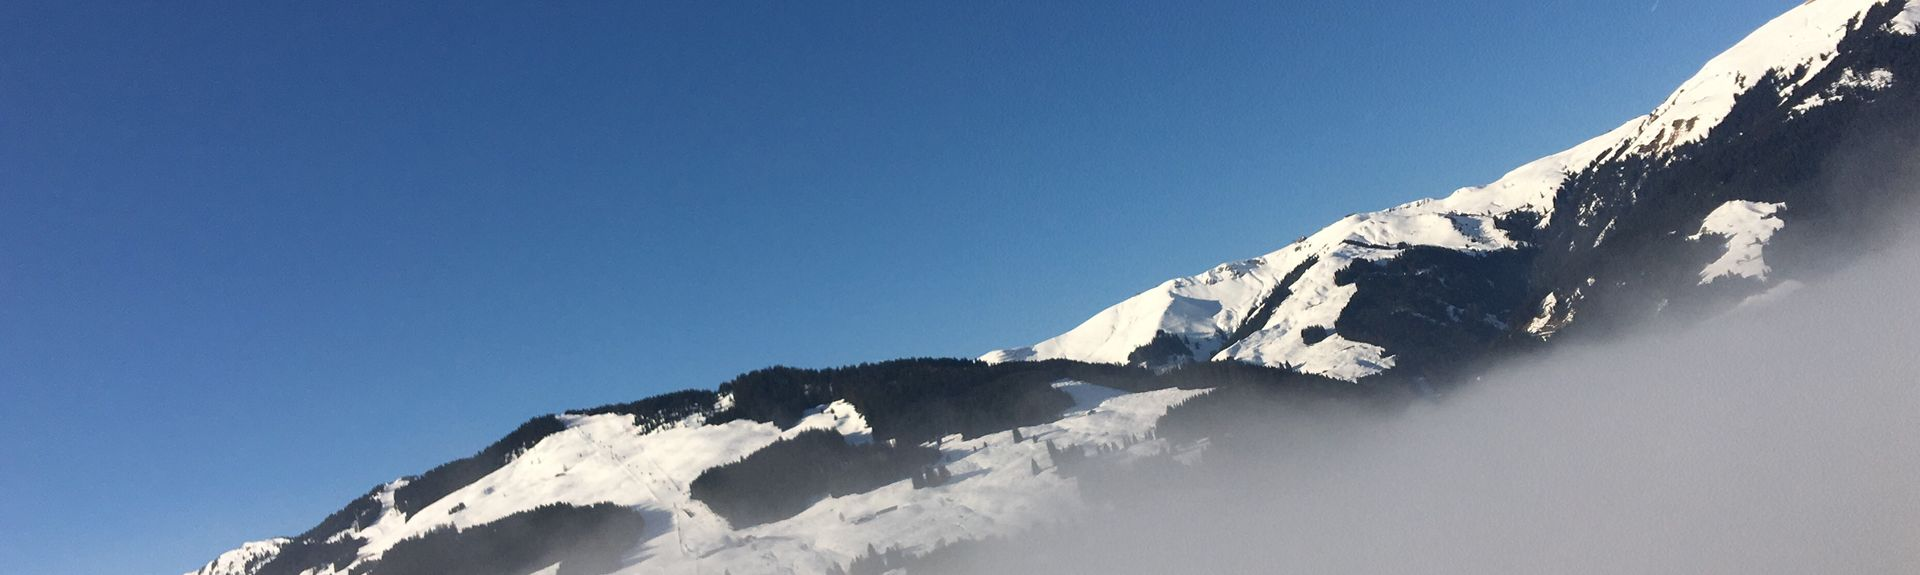 Funivia di Resterhöhe, Mittersill, Salisburgo, Austria